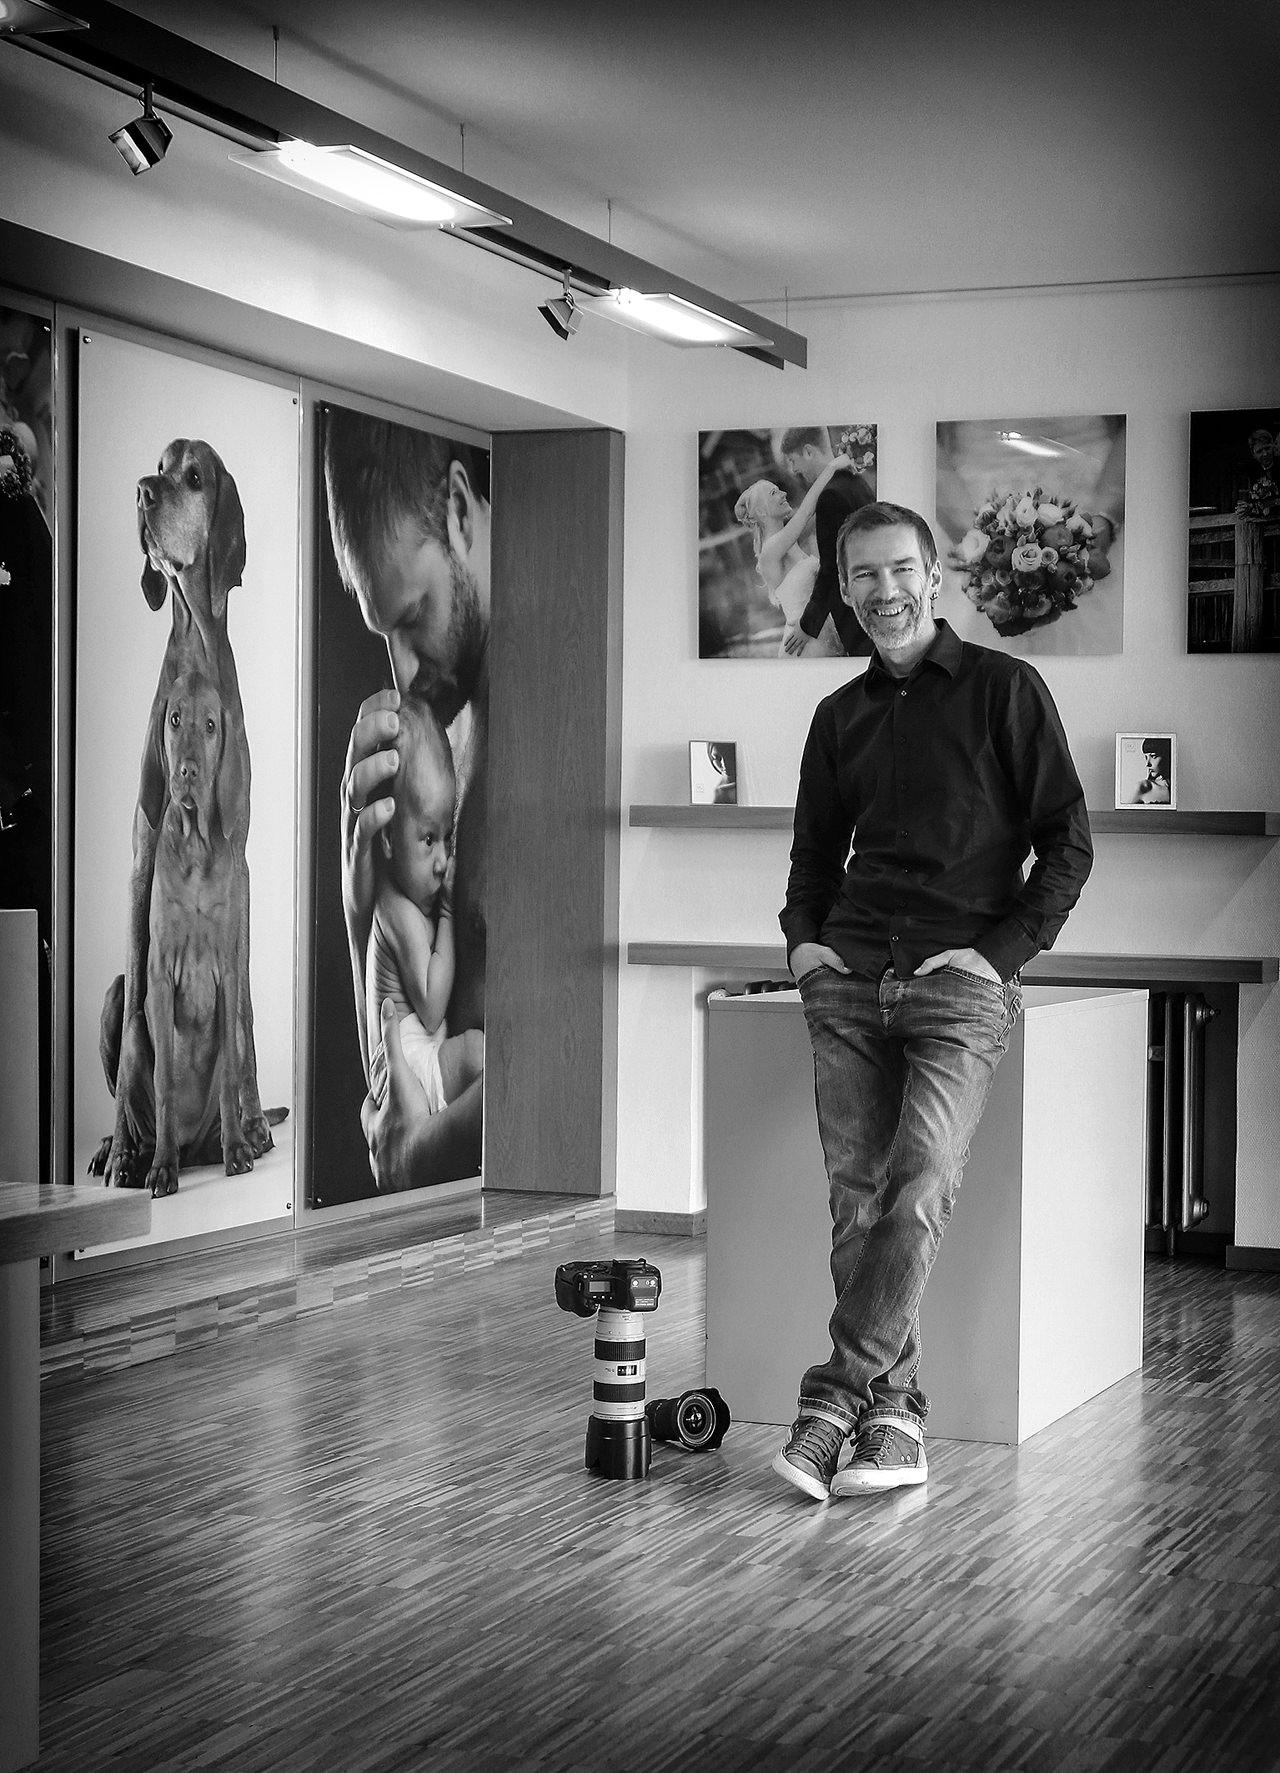 Fotograf Thomas Hillenbrand